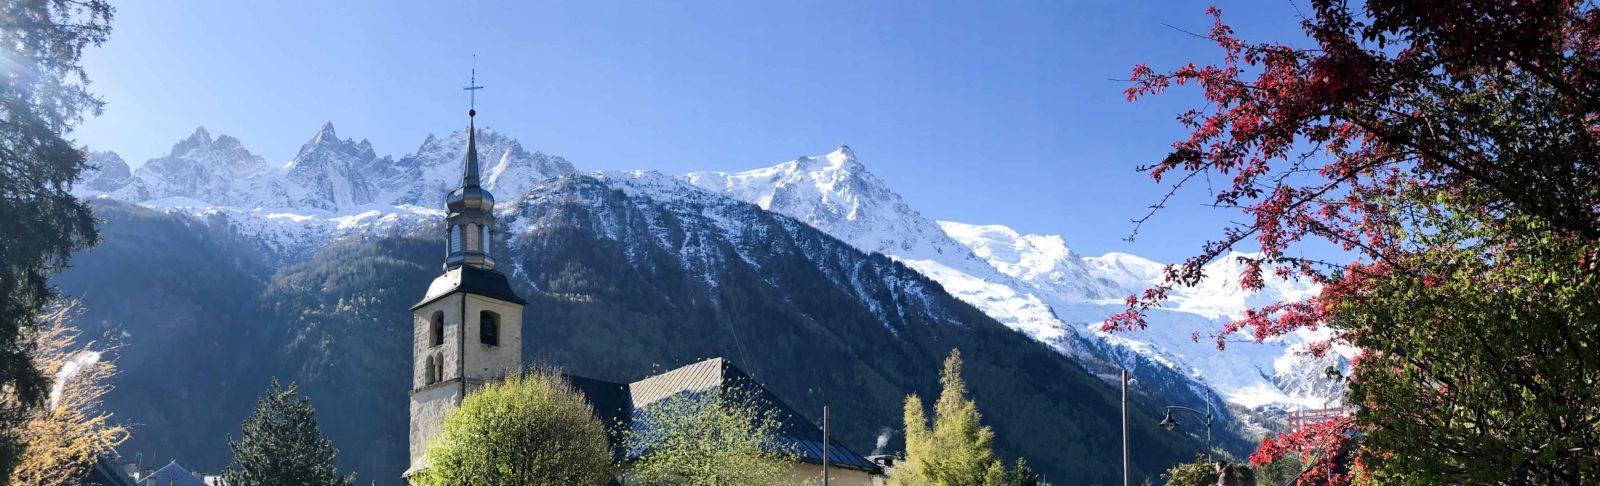 Chamonix panorama et église st Michel